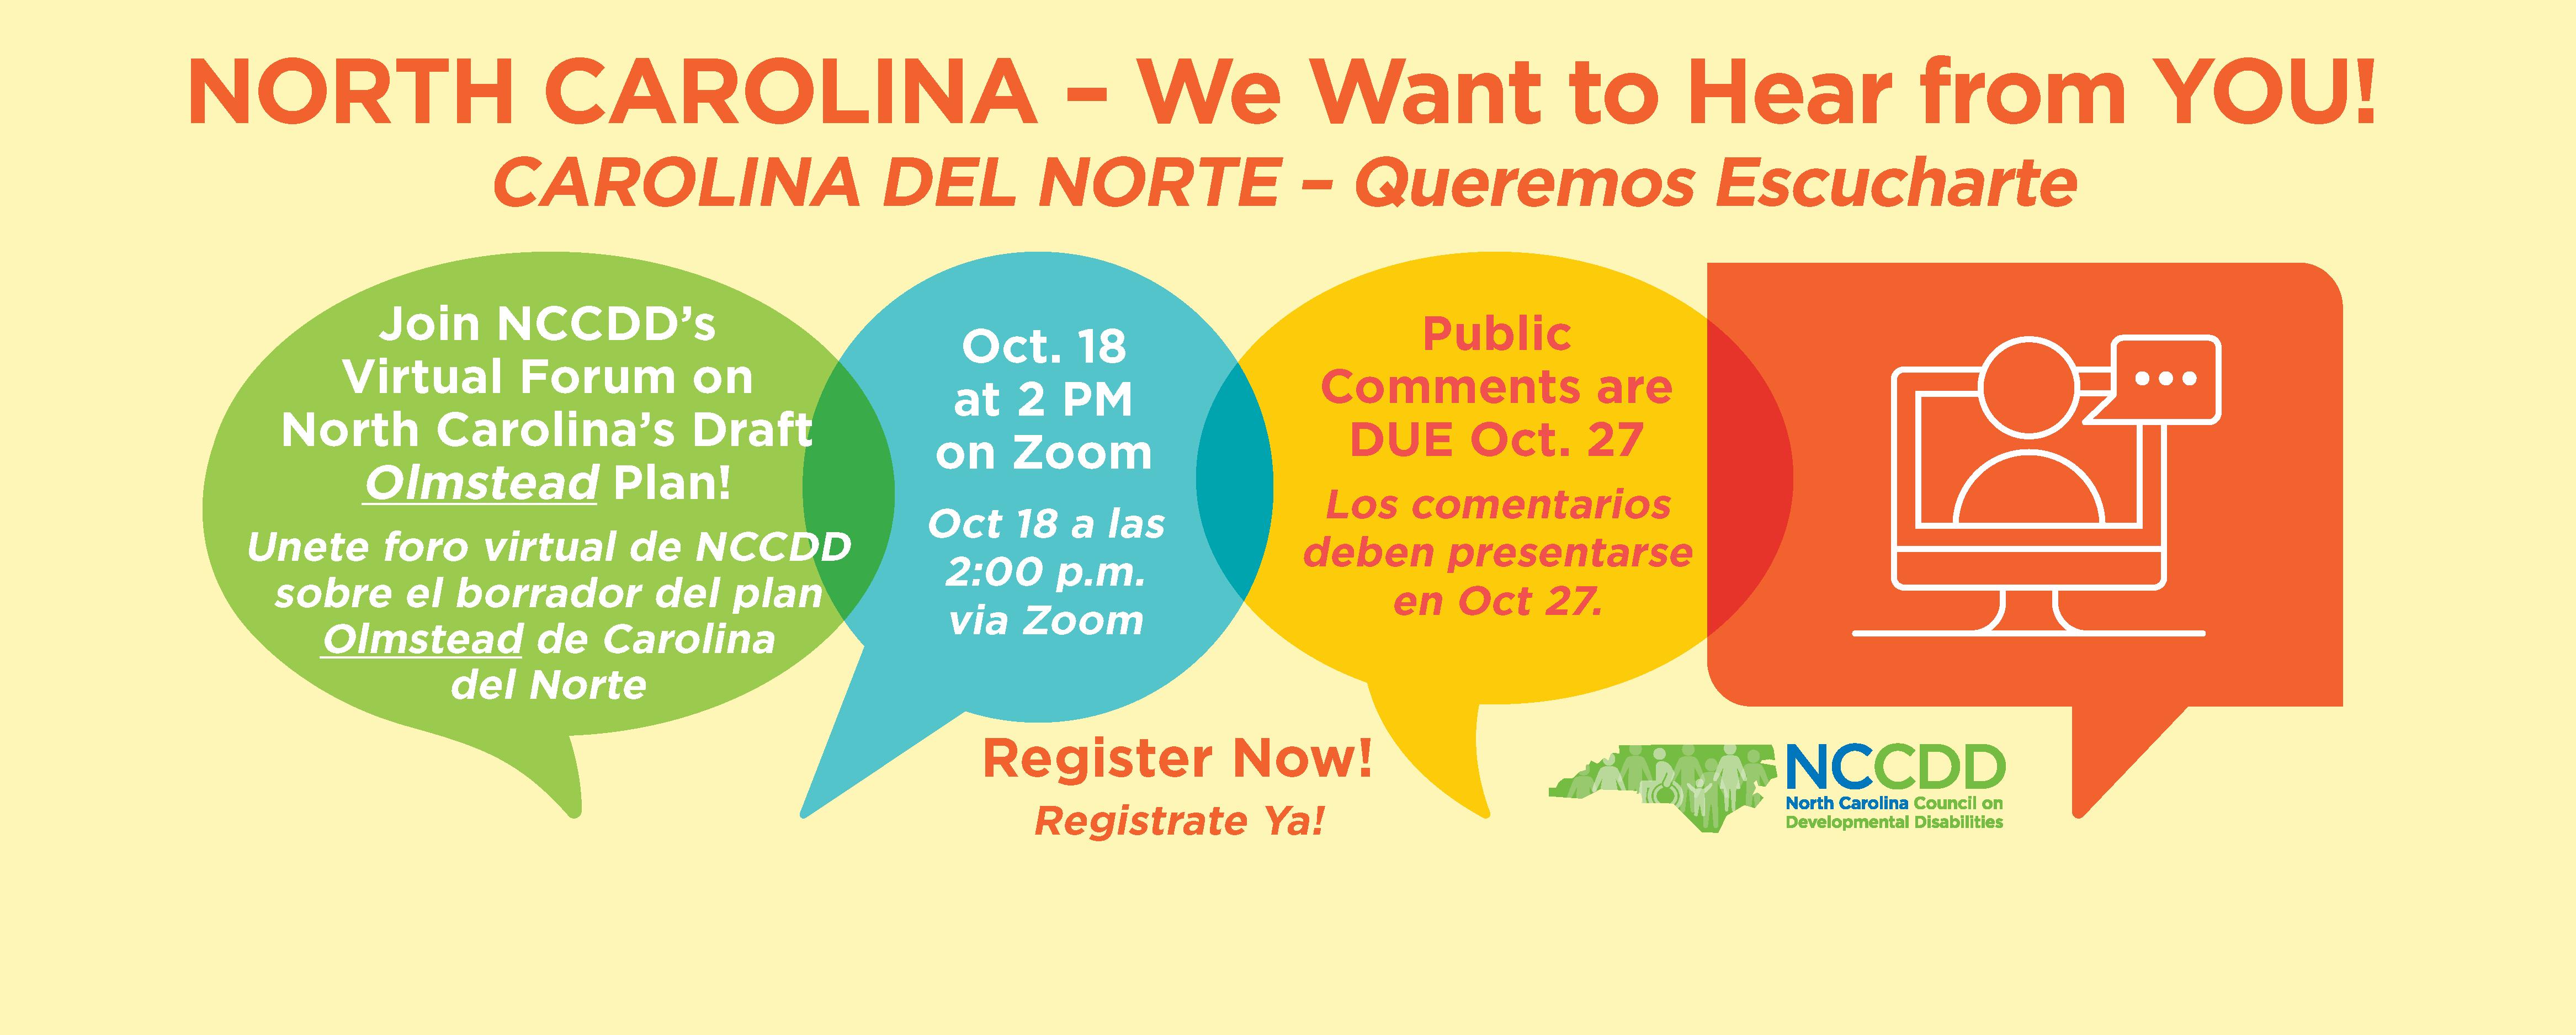 Join NCCDD's Virtual Forum on North Carolina's Draft Olmstead Plan! Oct 8 at 2 PM (Unete foro virtual de NCCDD sobre el borrador del plan Olmstead de Carolina  del Norte)